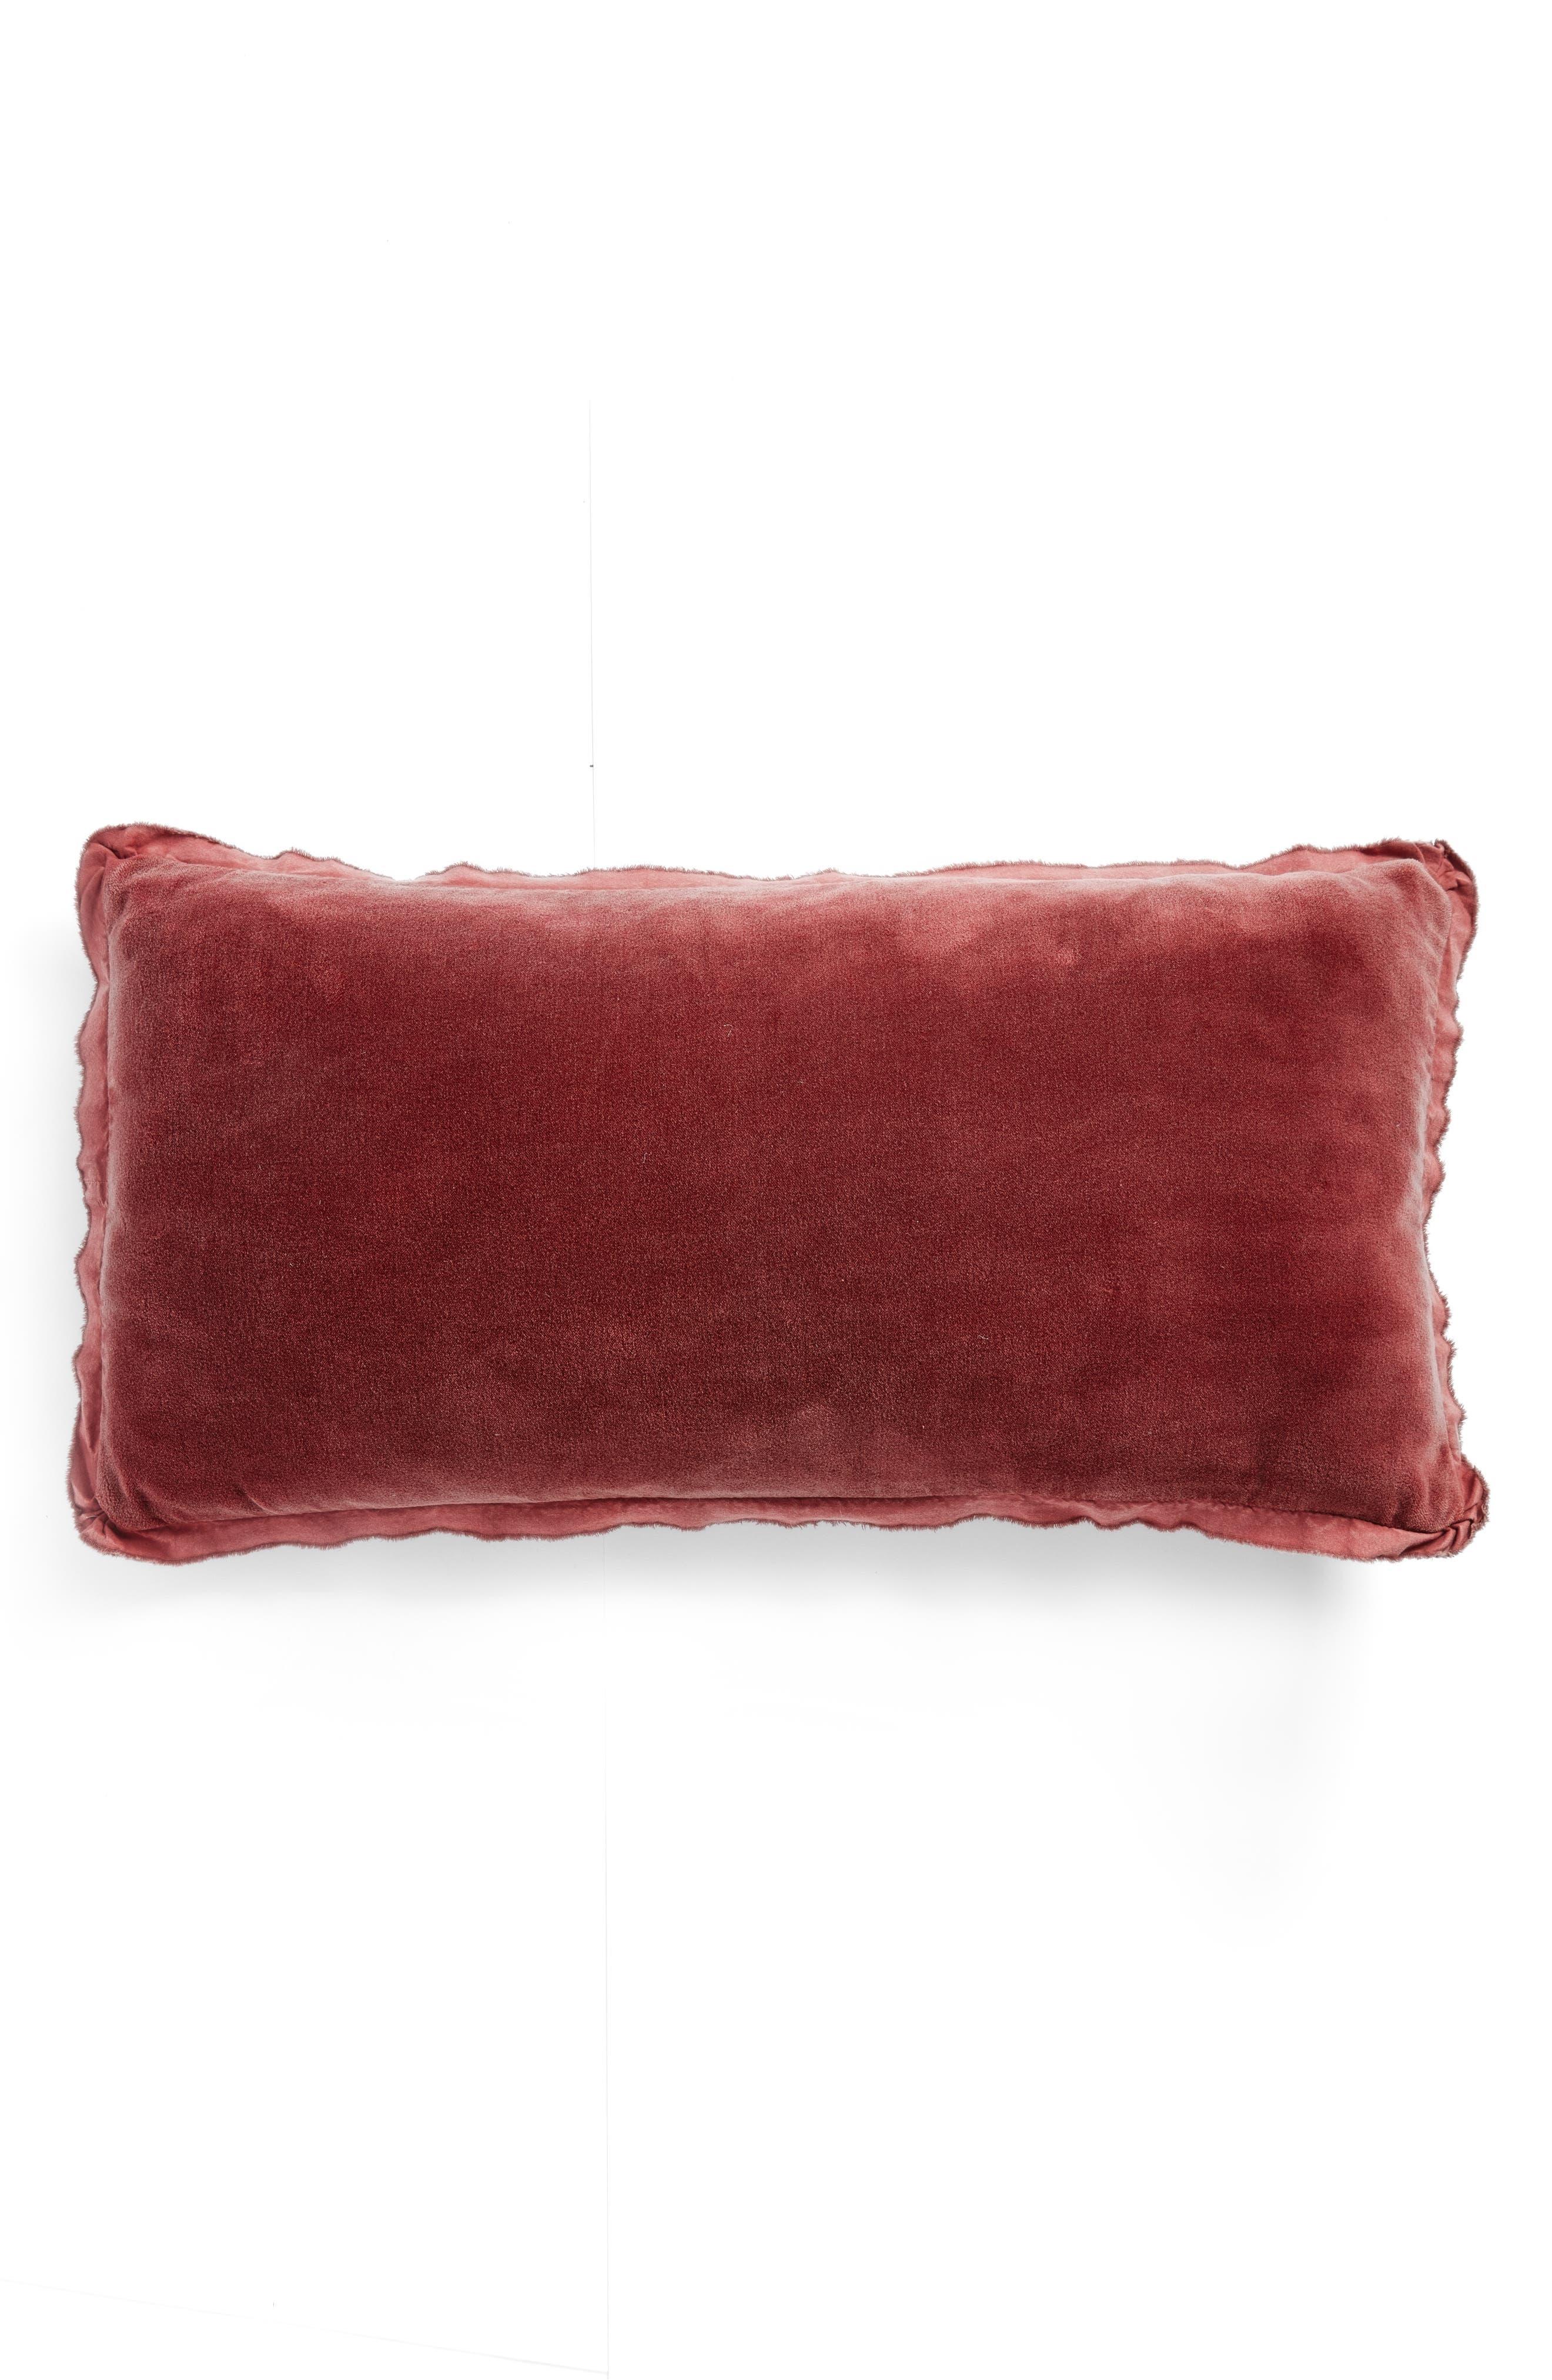 Velvet Accent Pillow,                         Main,                         color, BROWN ROSE